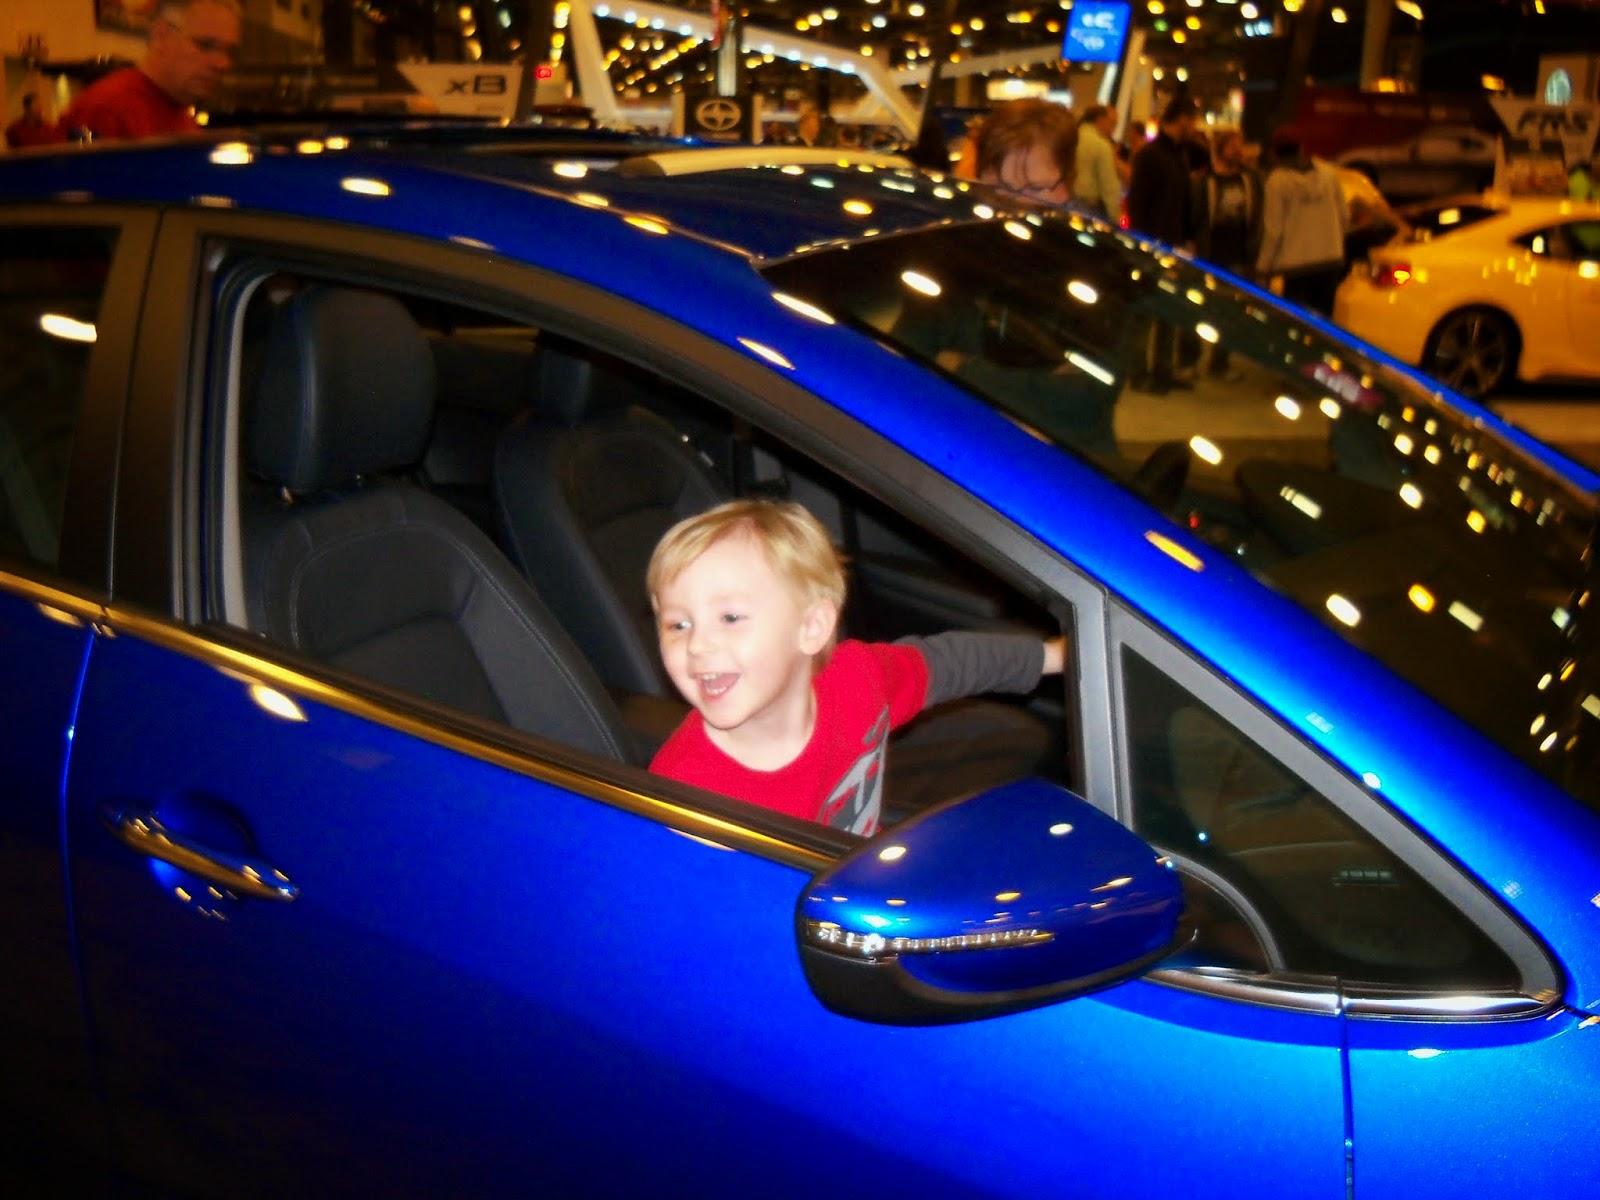 Houston Auto Show 2015 - 116_7361.JPG